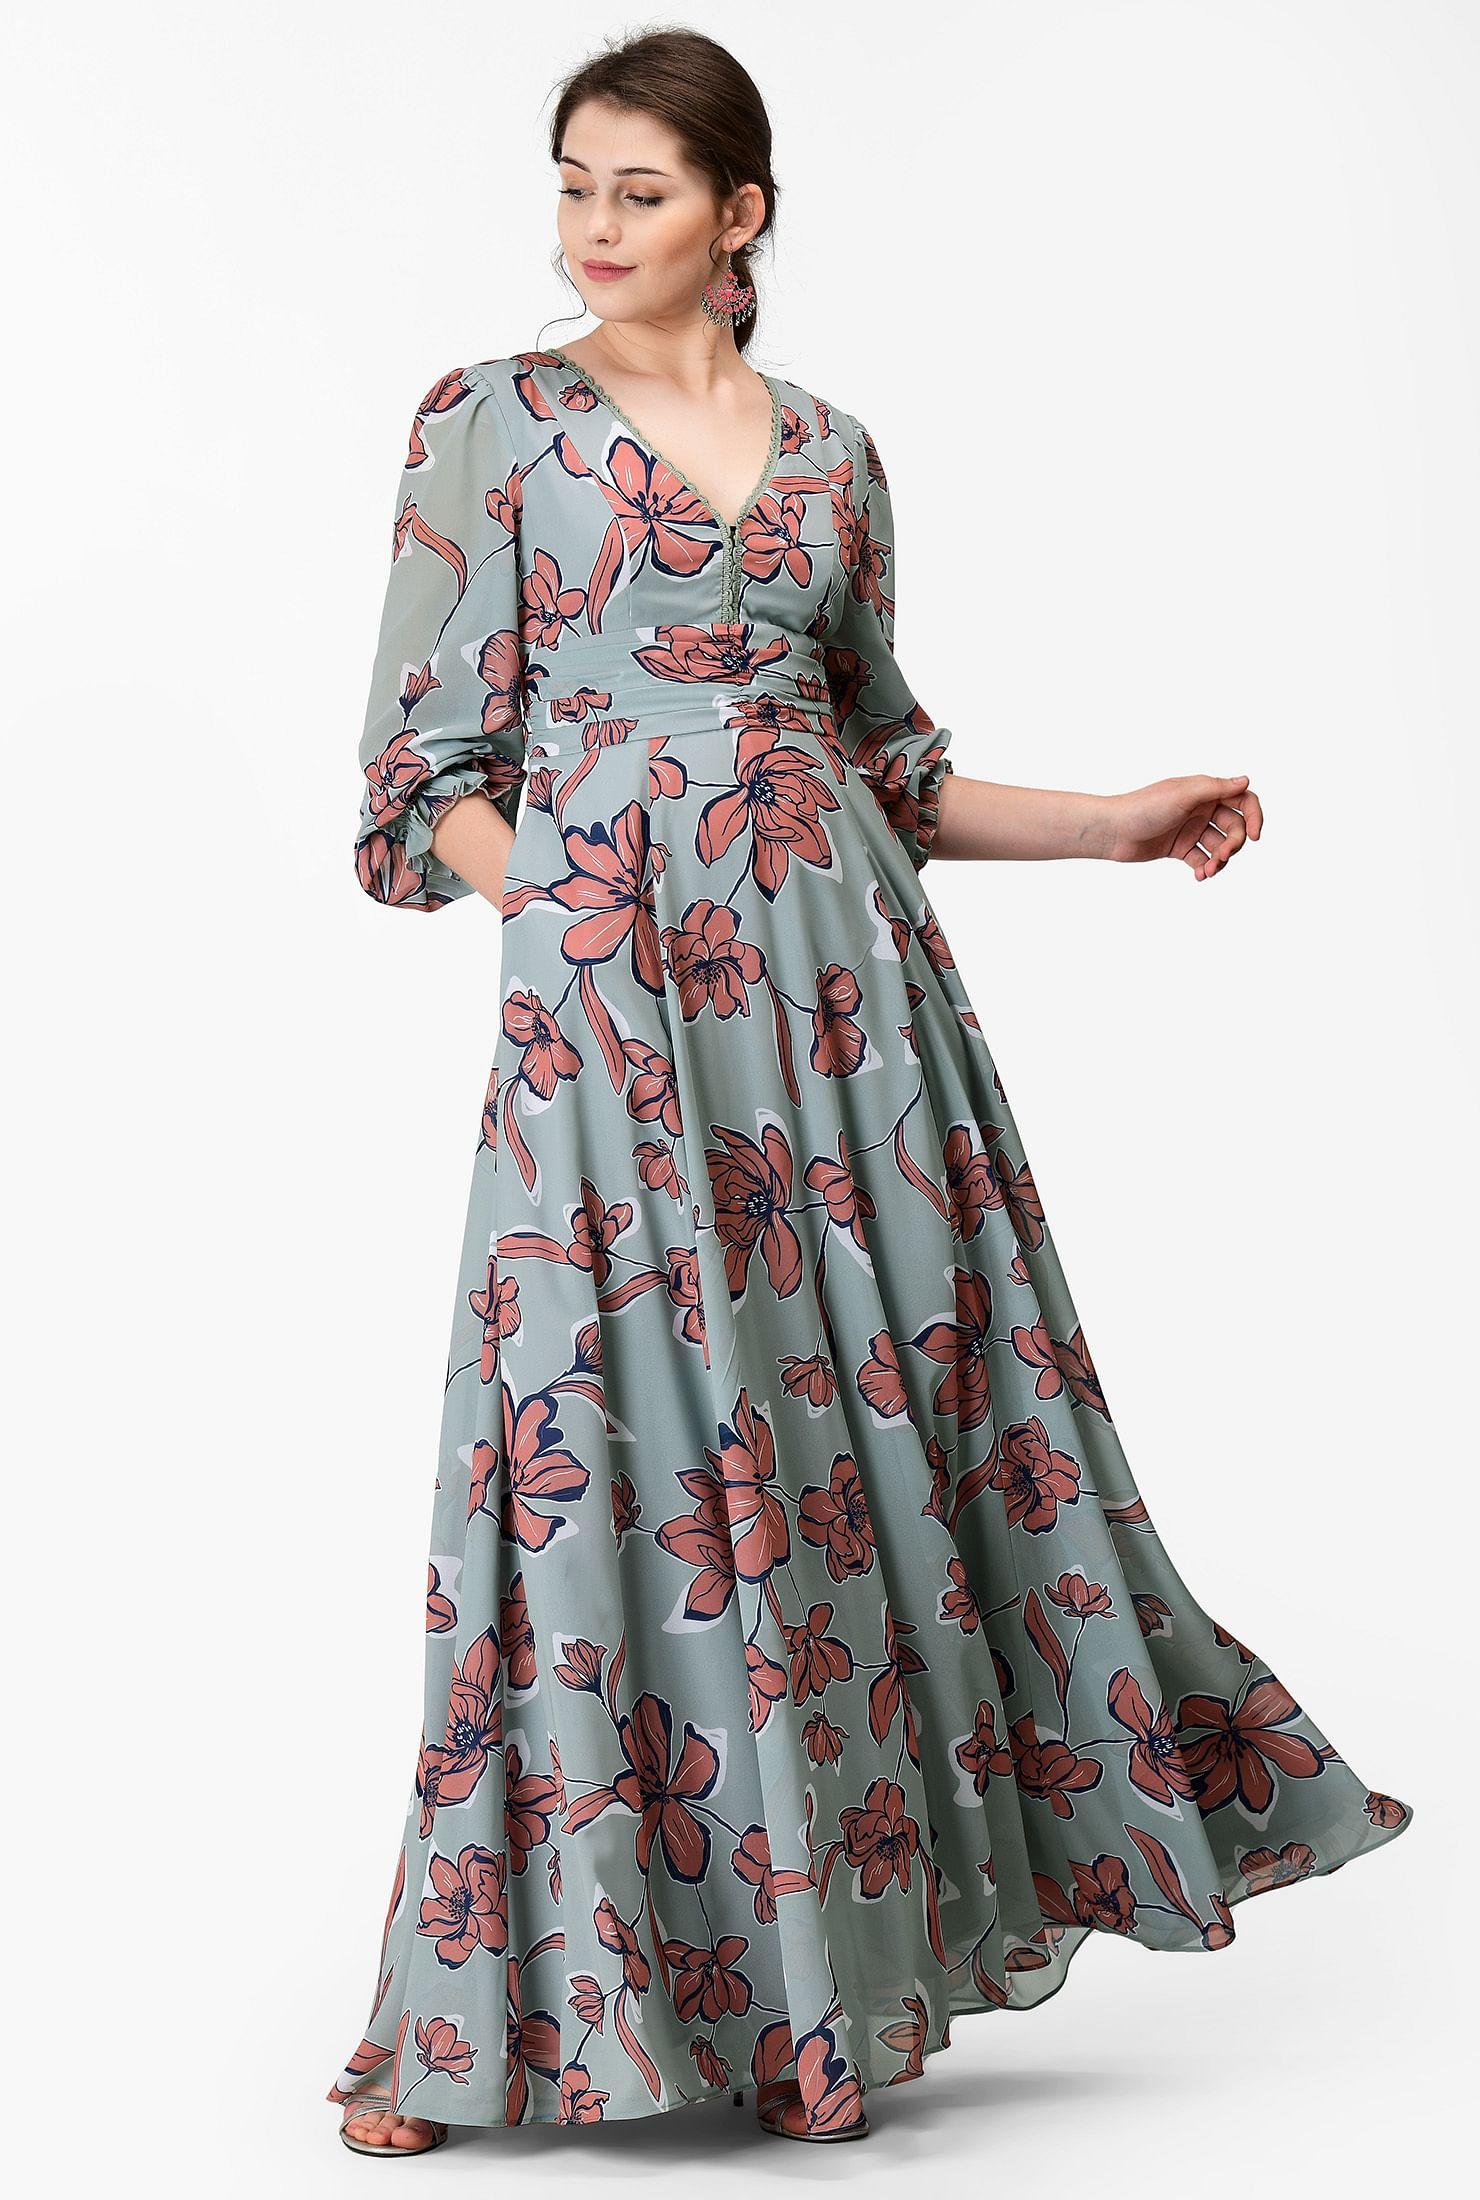 e142cdbb10 All size inclusive, casual event dresses, custom size, custom style, petites